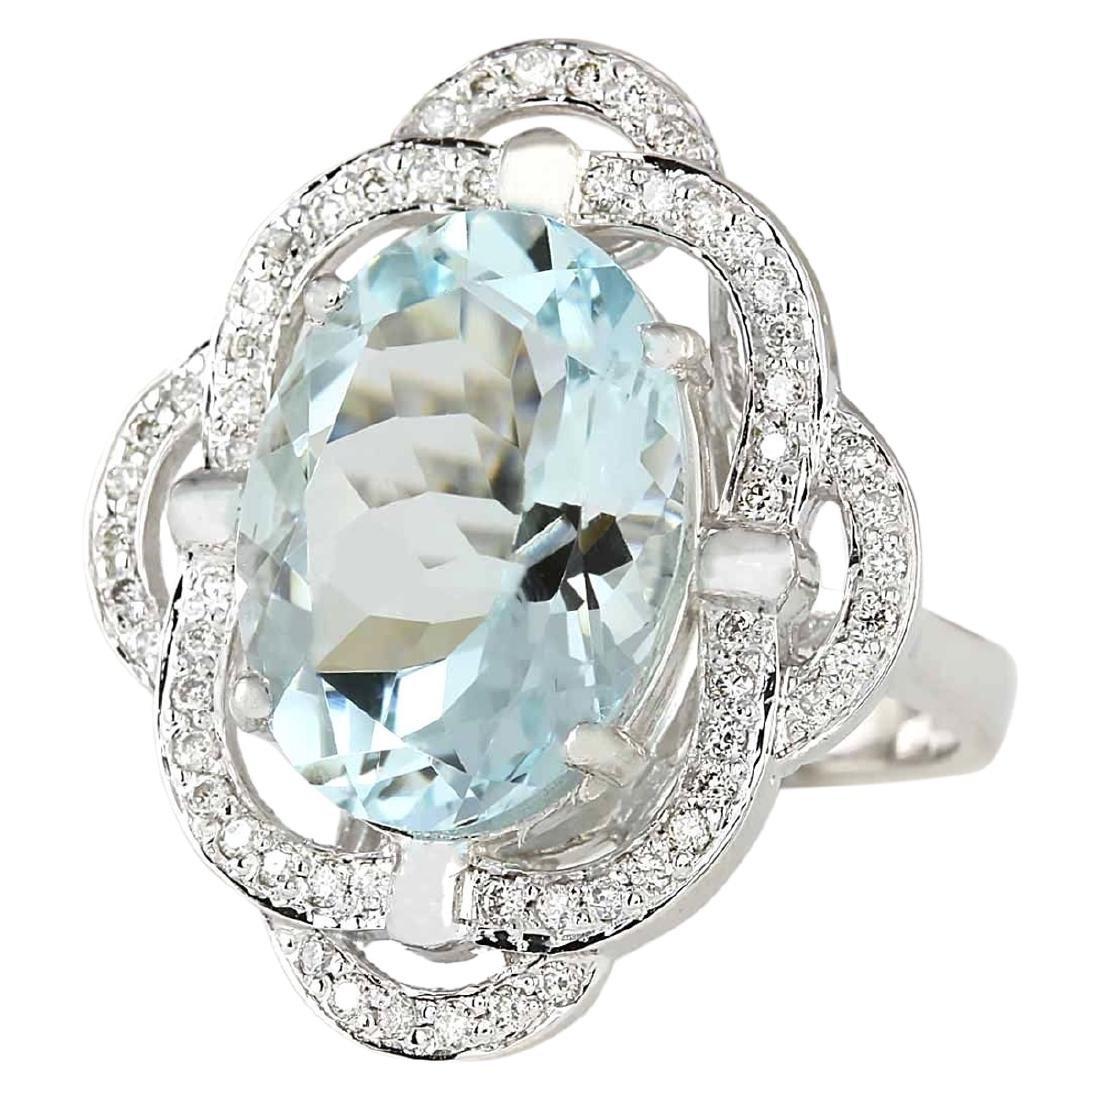 6.97 CTW Natural Aquamarine And Diamond Ring In 18K - 2